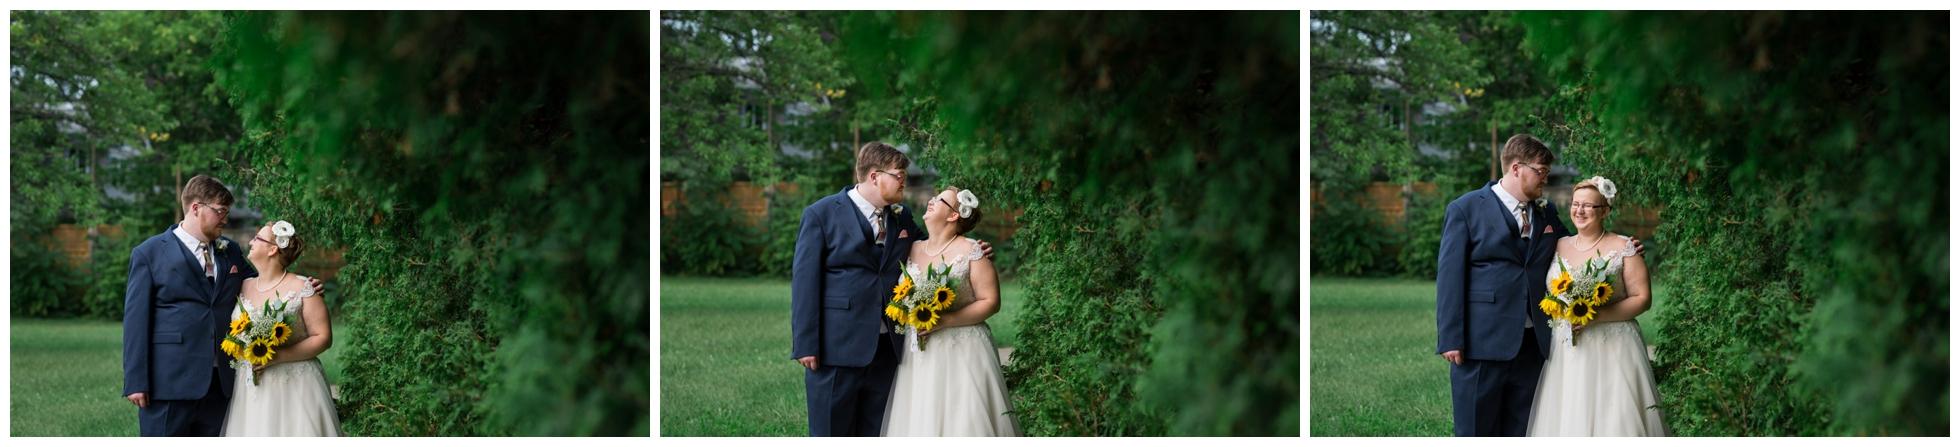 Toronto Wedding Chris Kate (Selena Phillips-Boyle)_0024.jpg